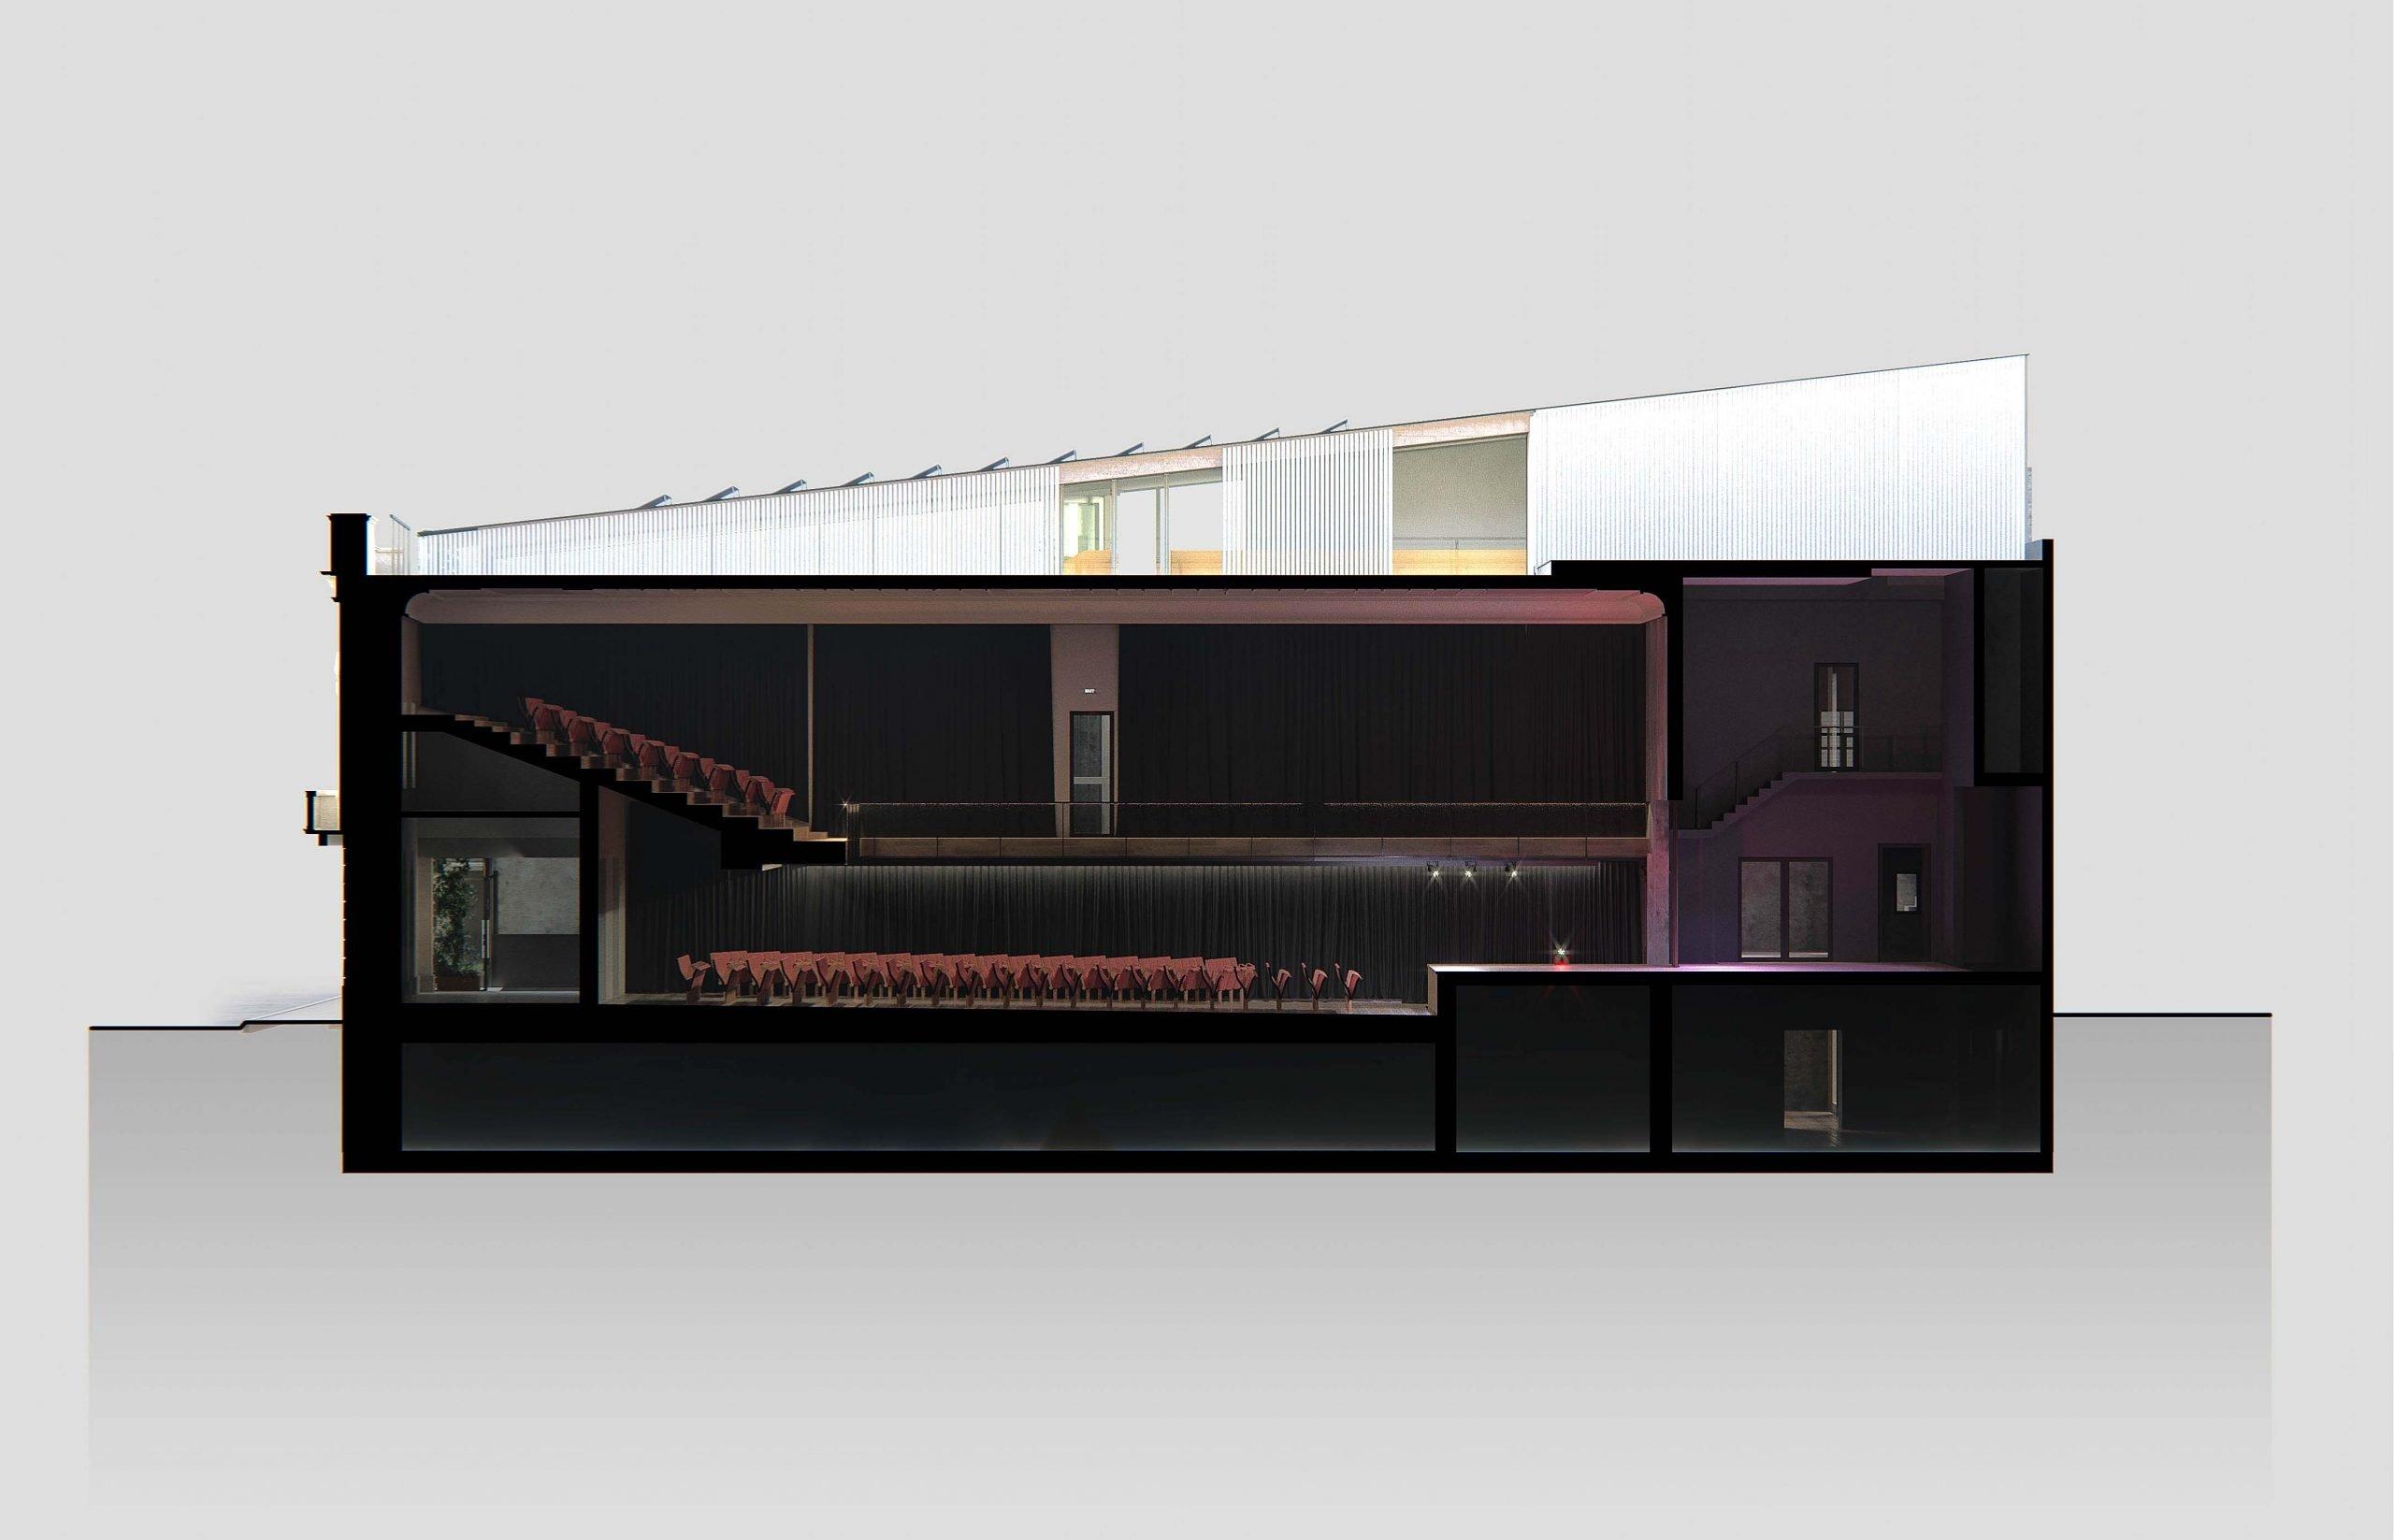 https://dprostudio.com/wp-content/uploads/2020/11/Teatru-Salesjan-_-section-2-scaled.jpg